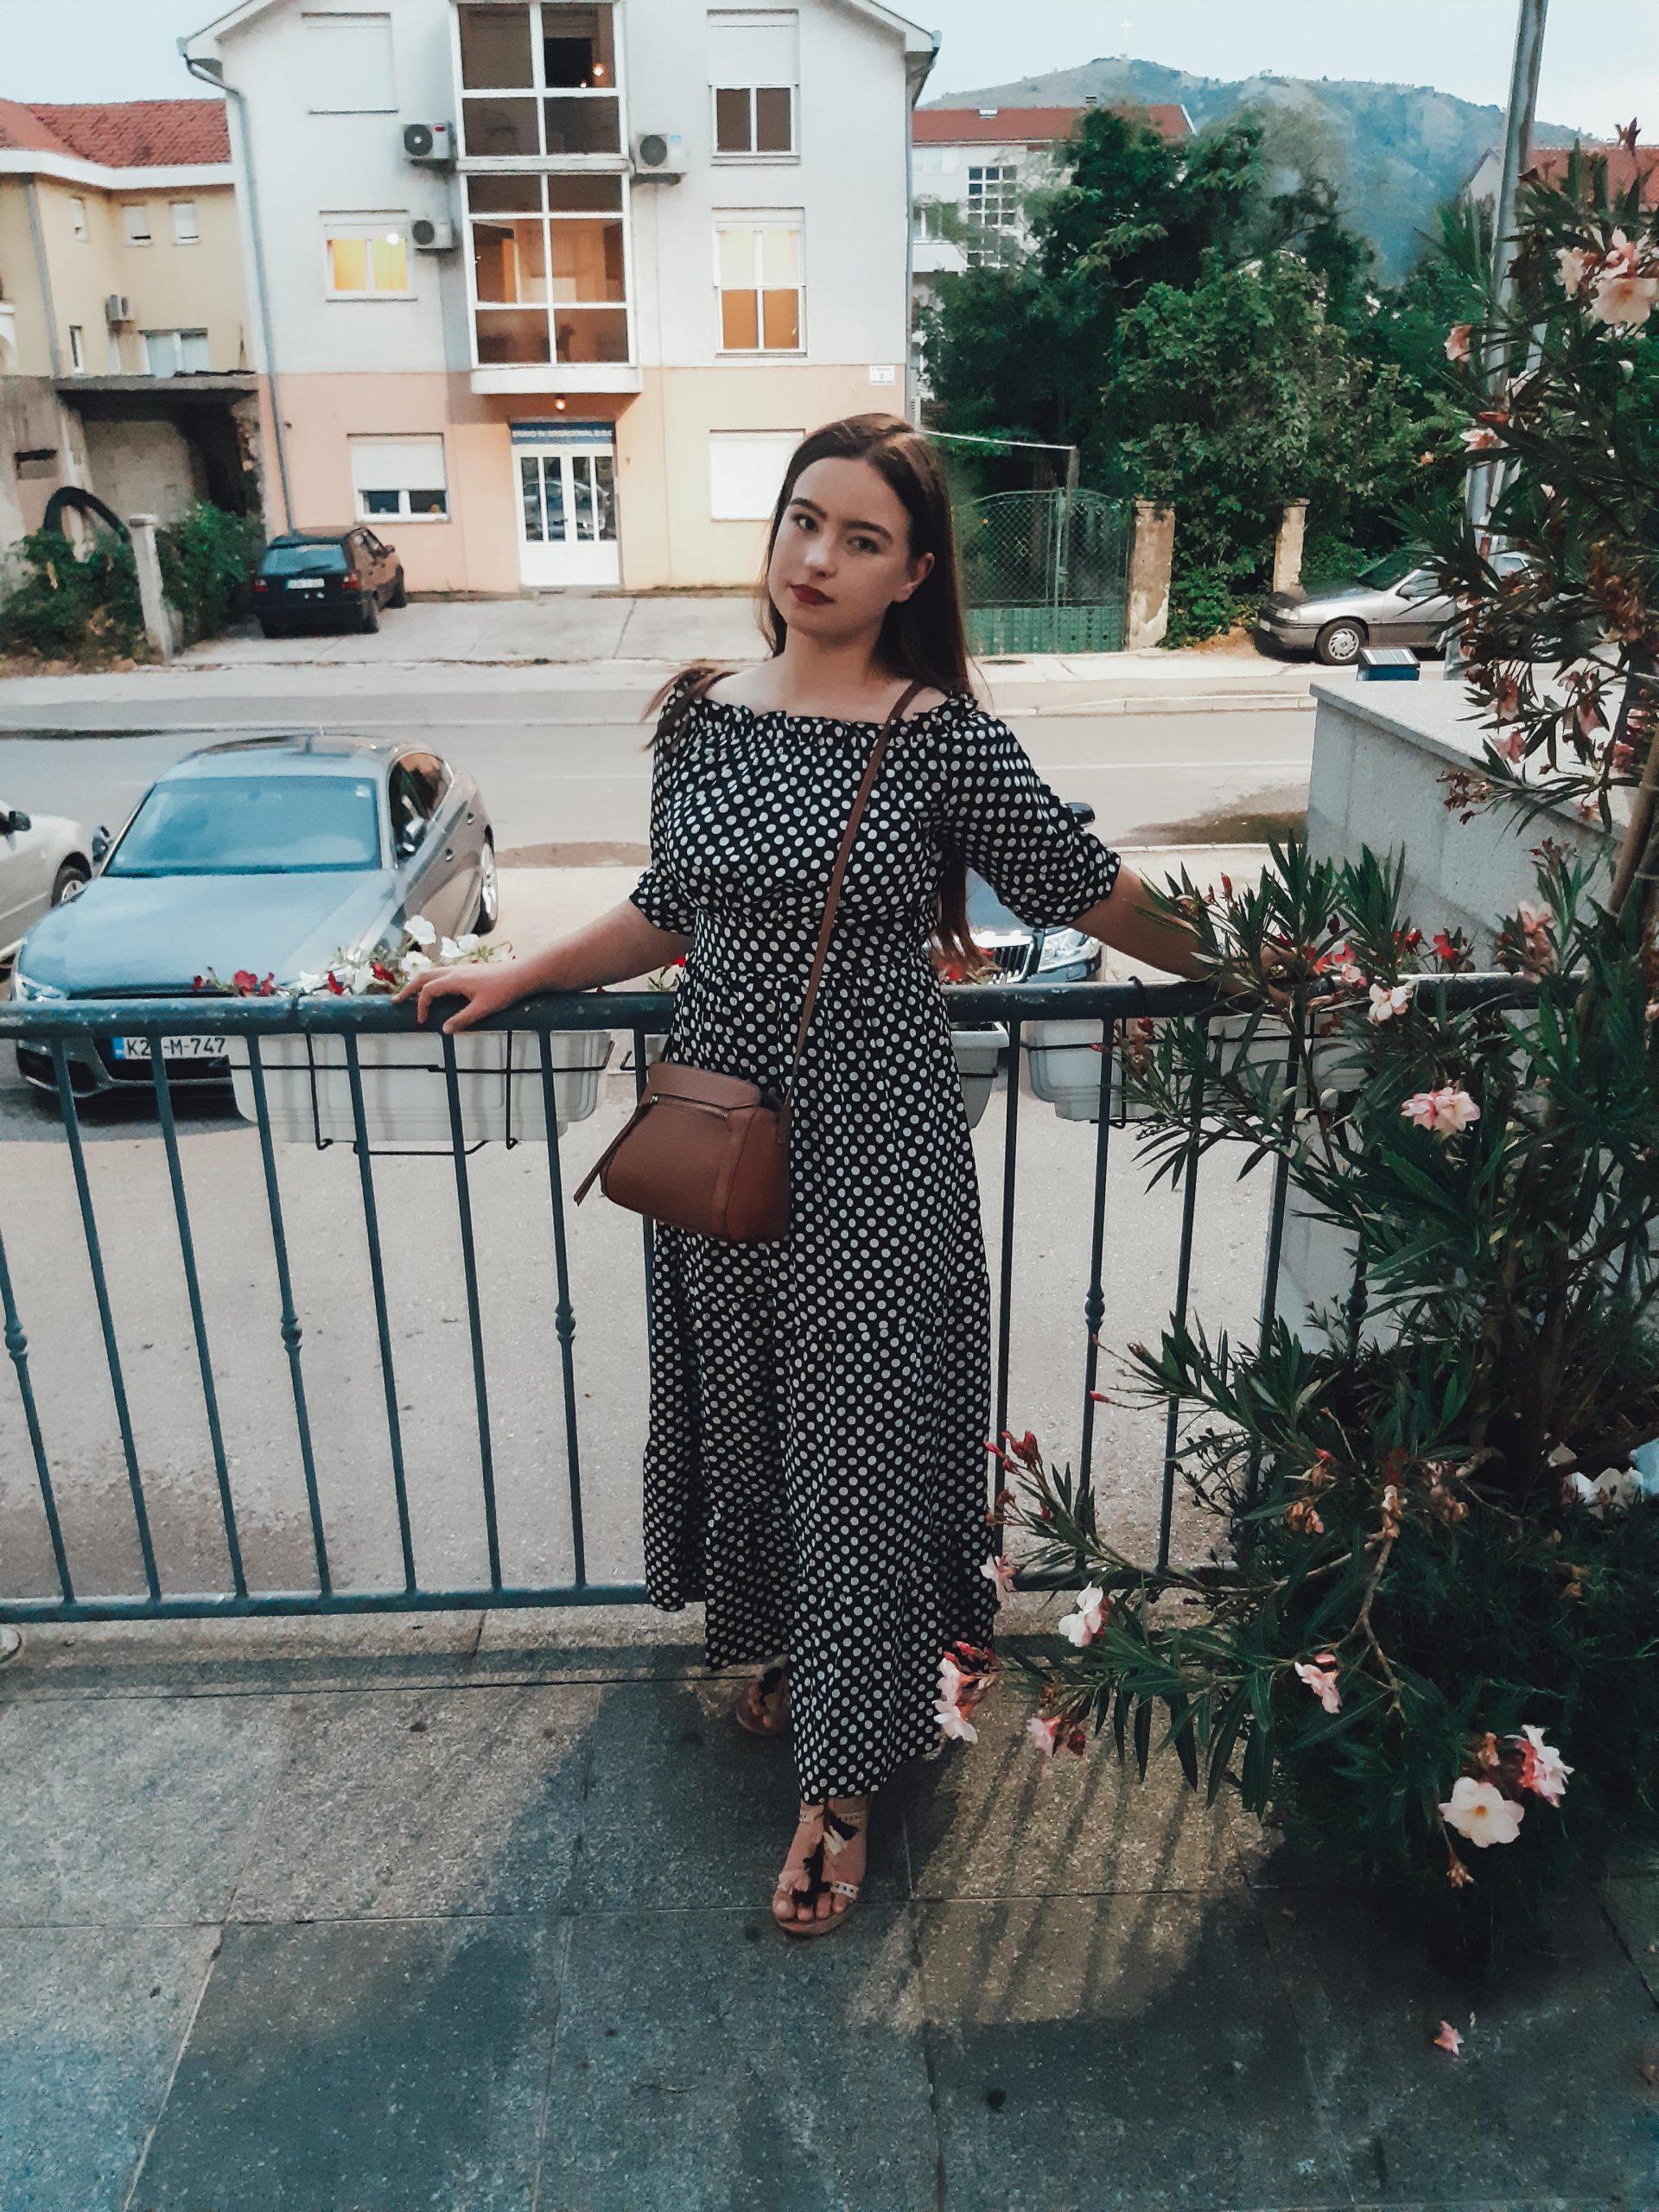 polka dot dress outfit livinglikev fashion blogger style blogger living like v vildana šuta vildana livinglikev polka dot dress rosegal review